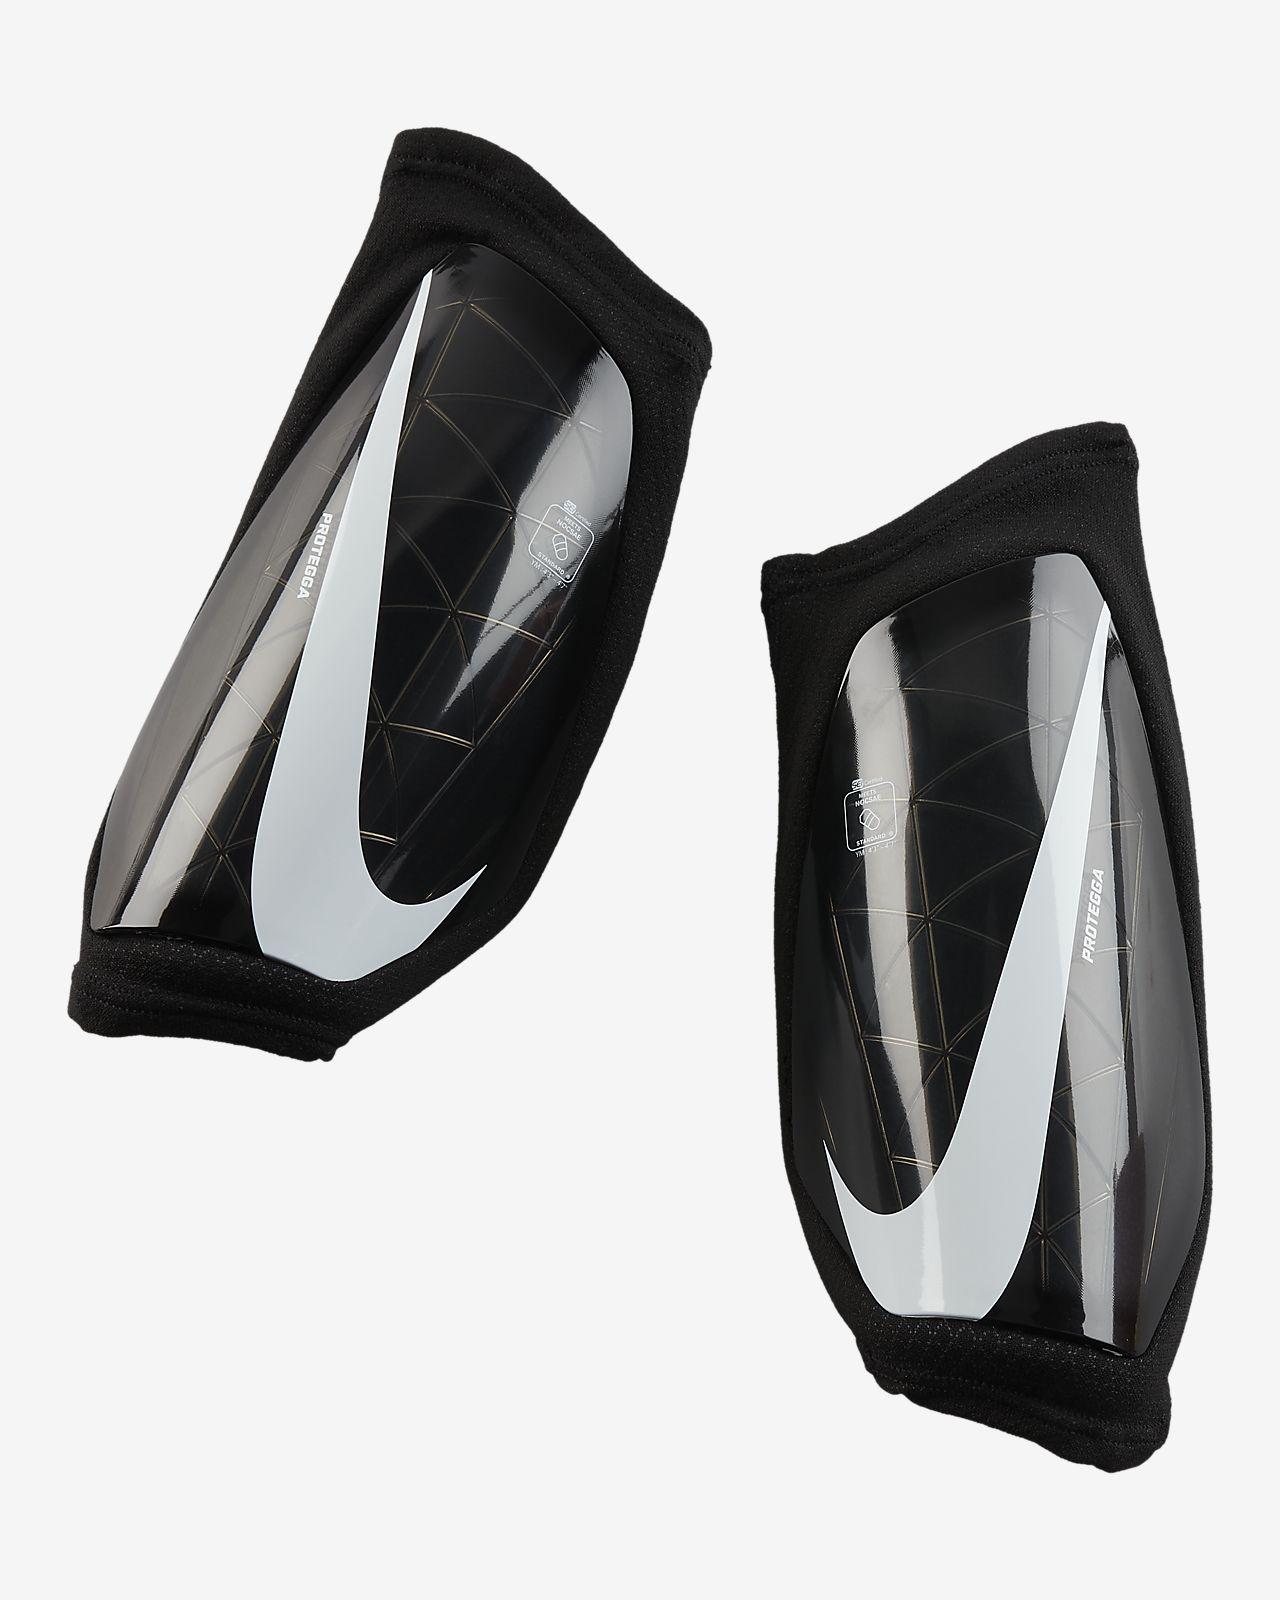 Nike Protegga-fodboldbenskinner til børn